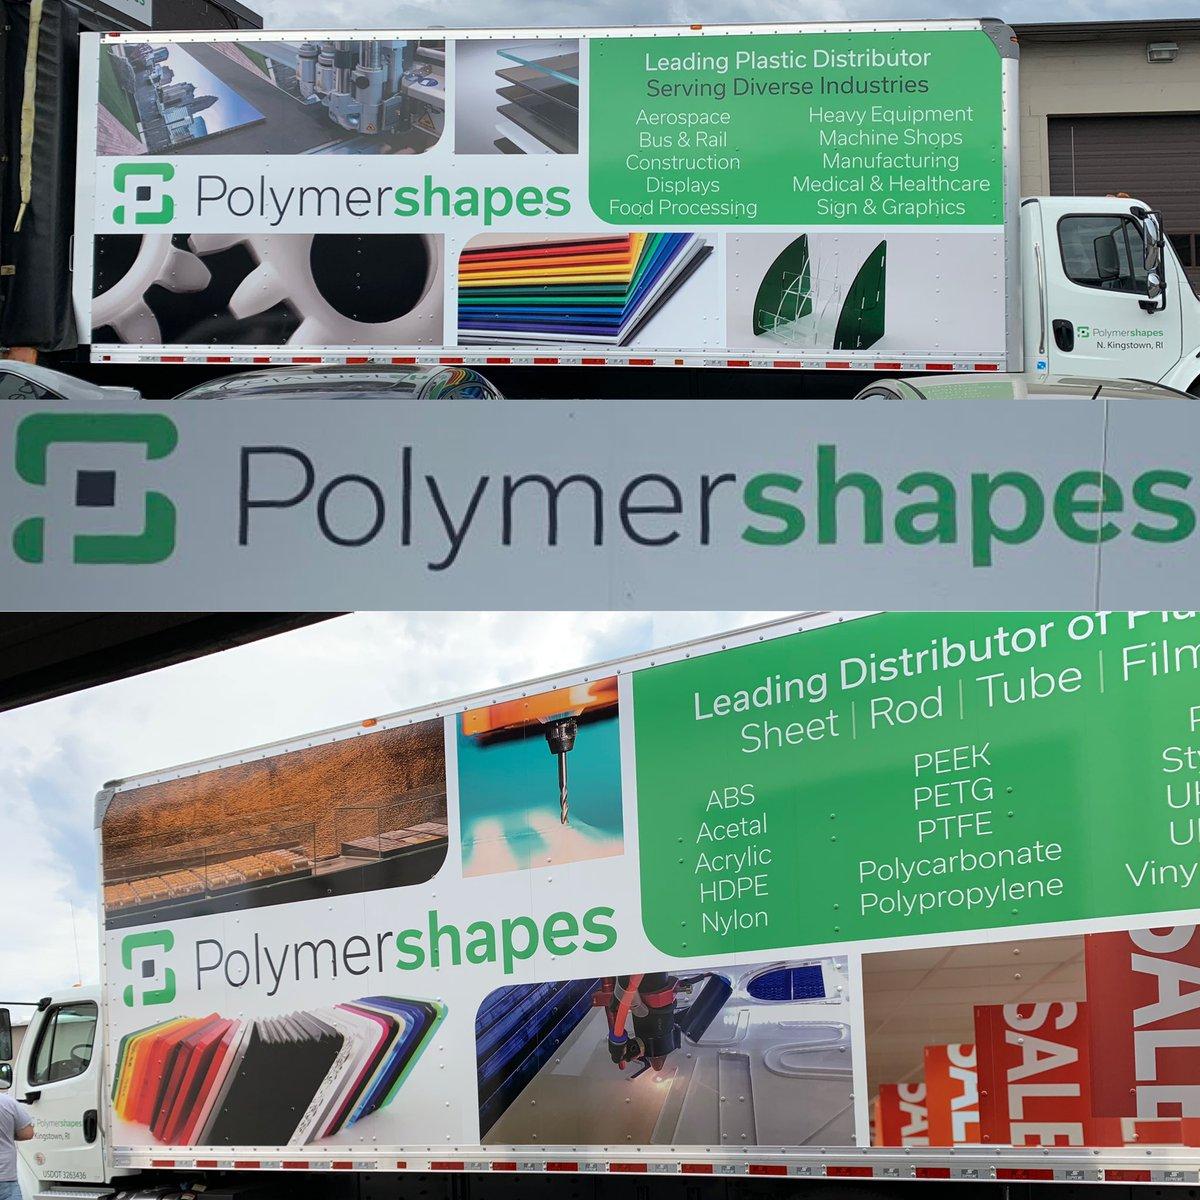 polymershapes хаштаг в Twitter